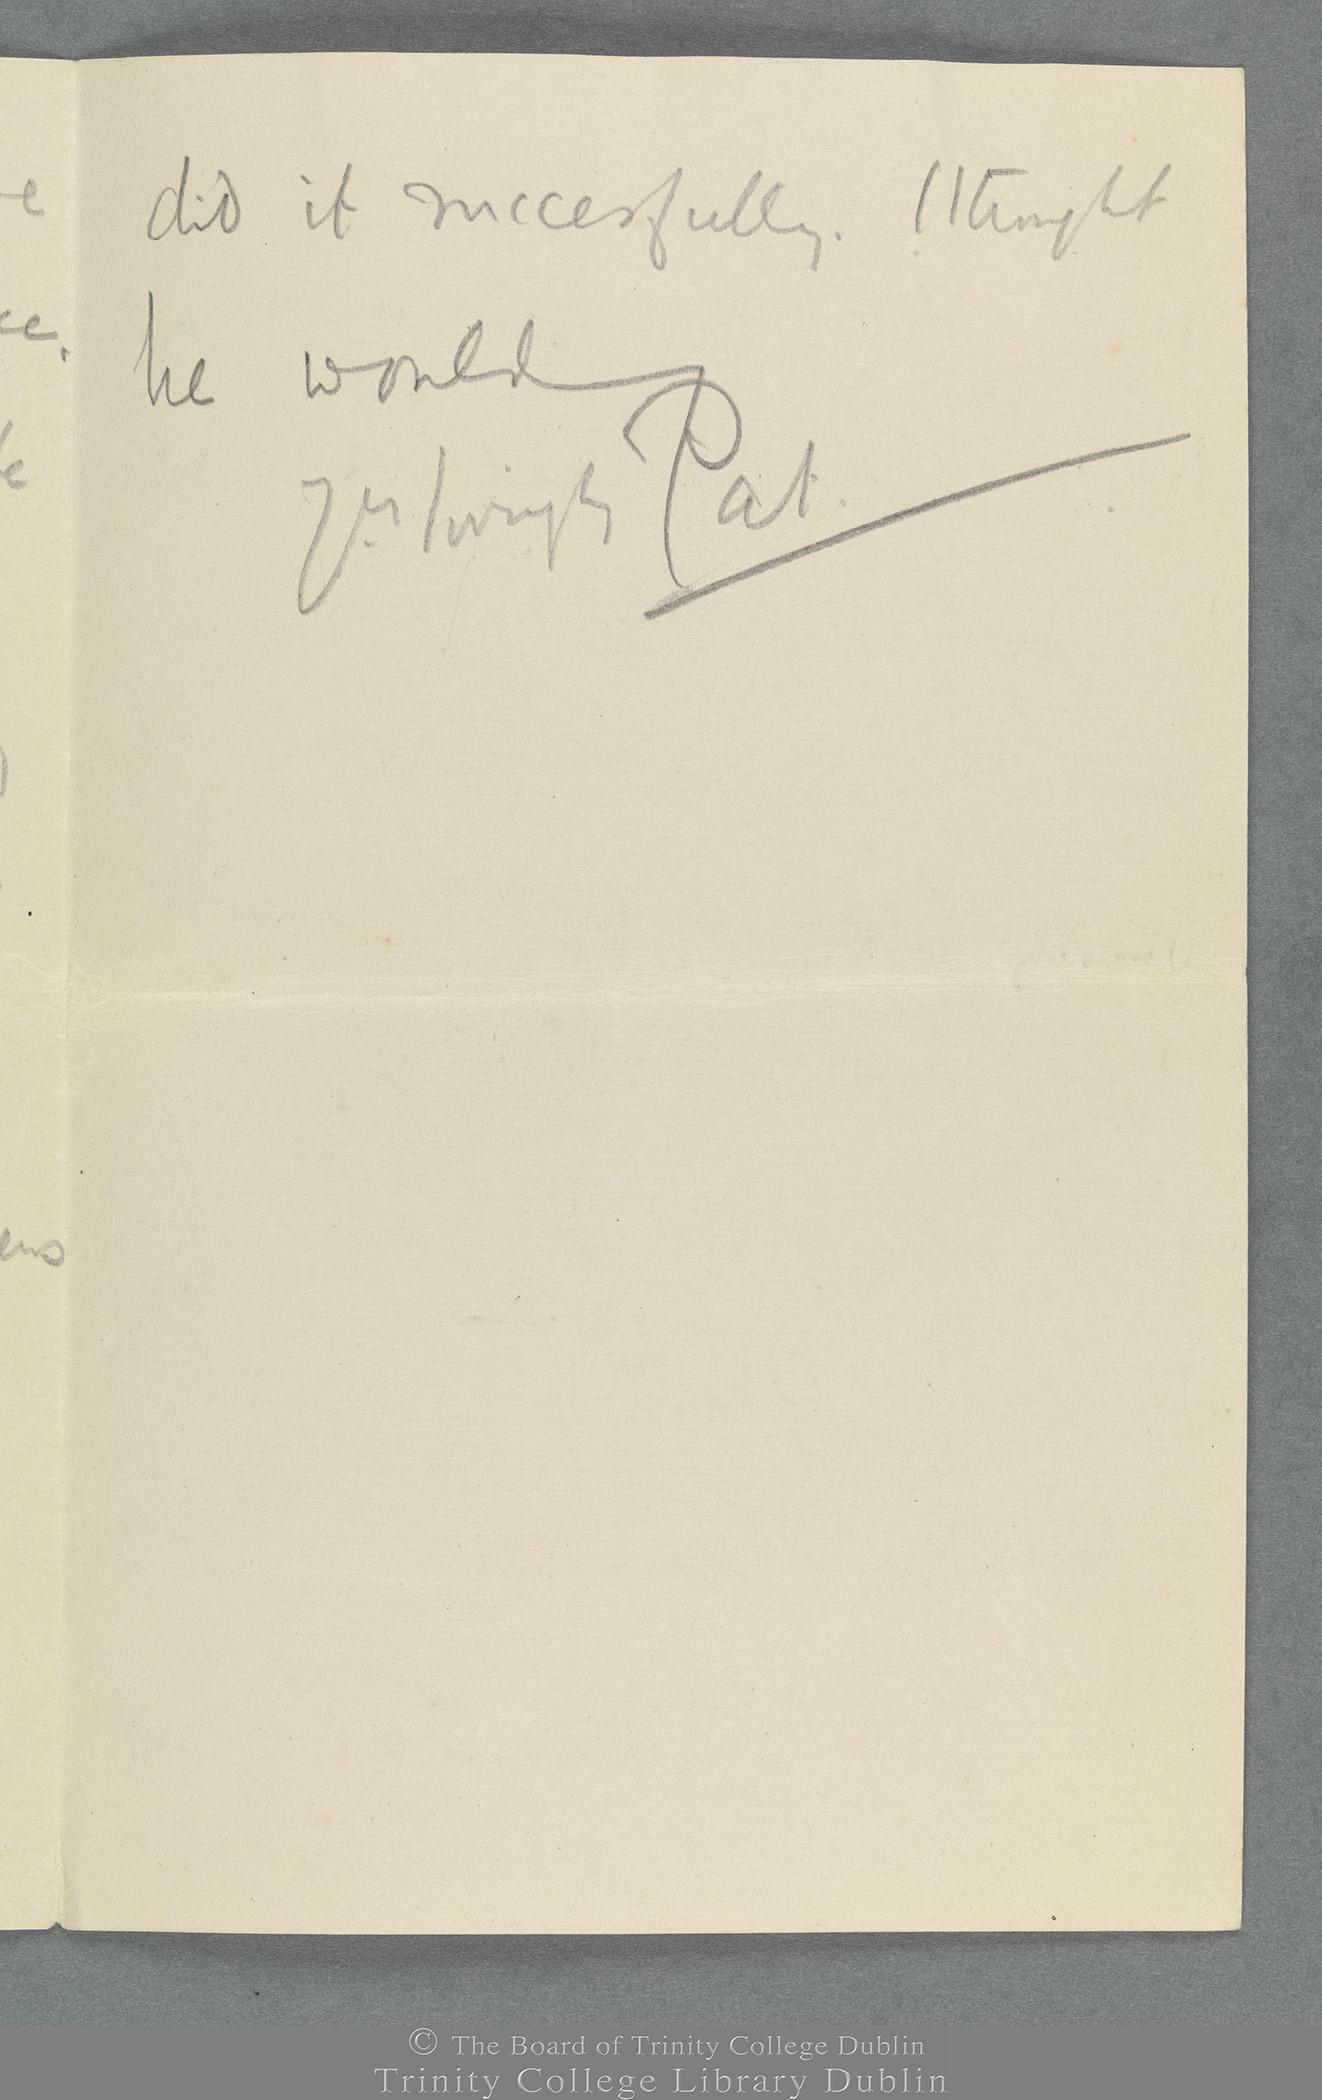 TCD MS 11274/5 folio 4 recto